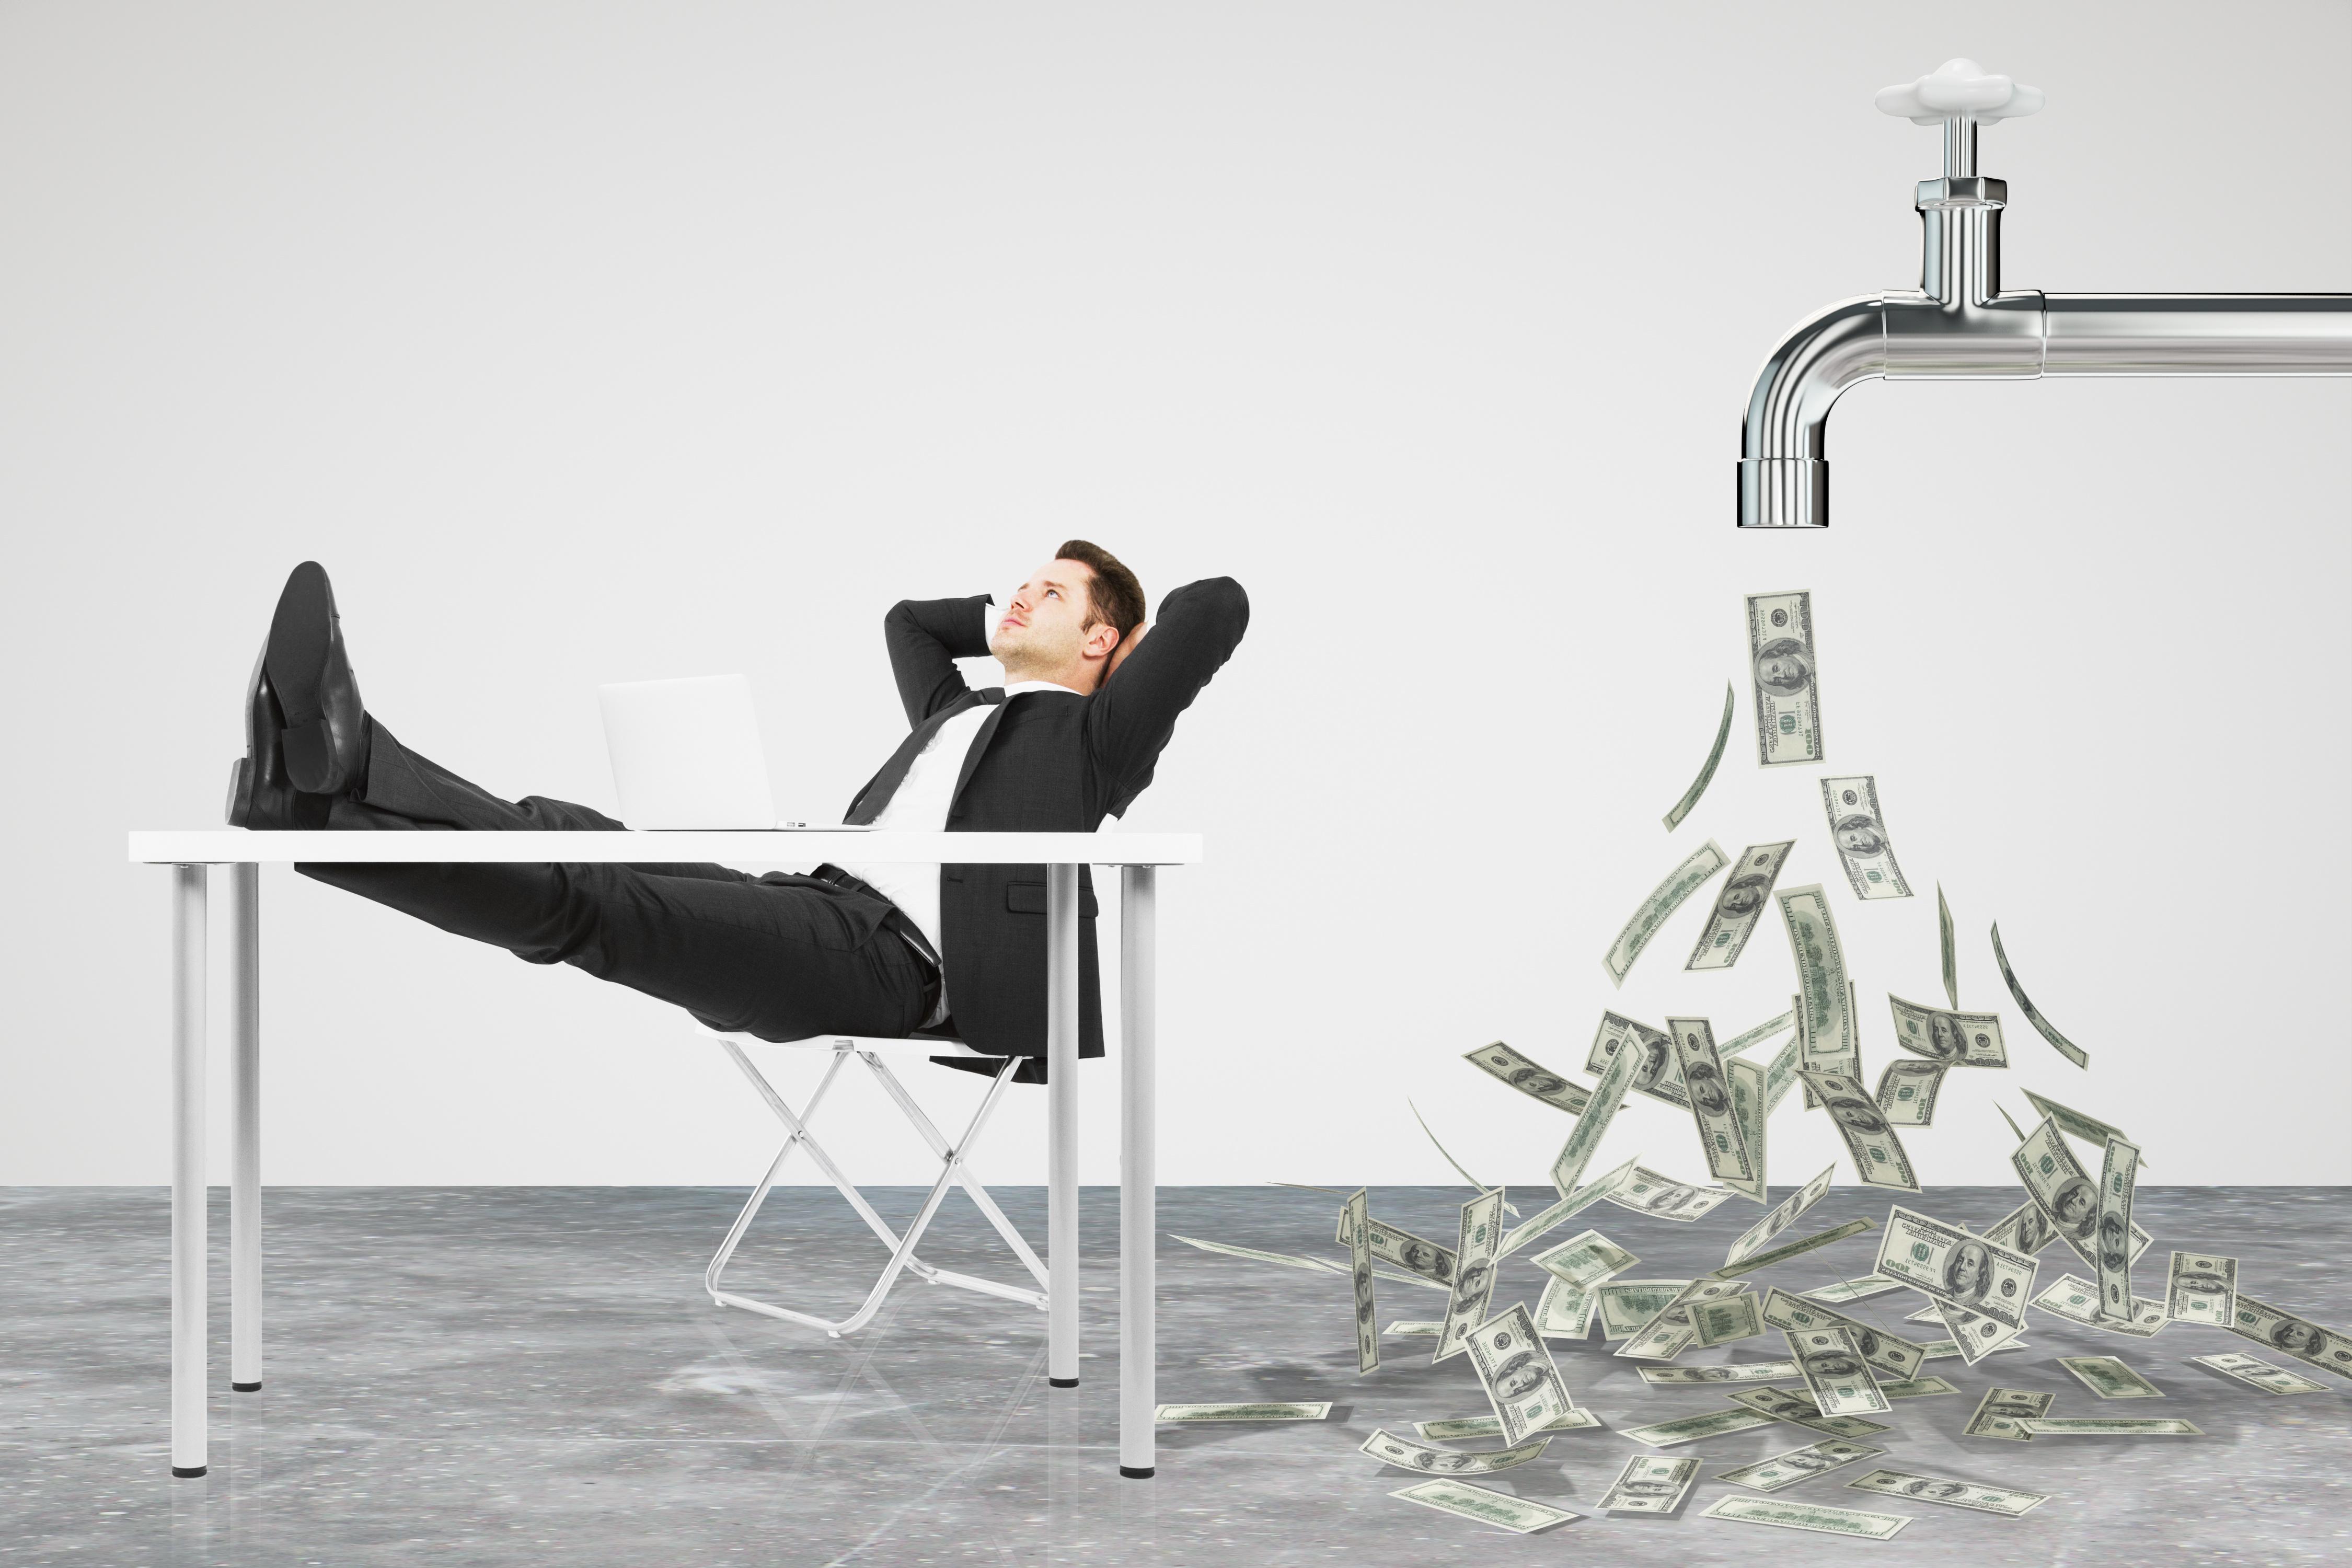 Cashflow for plumbers